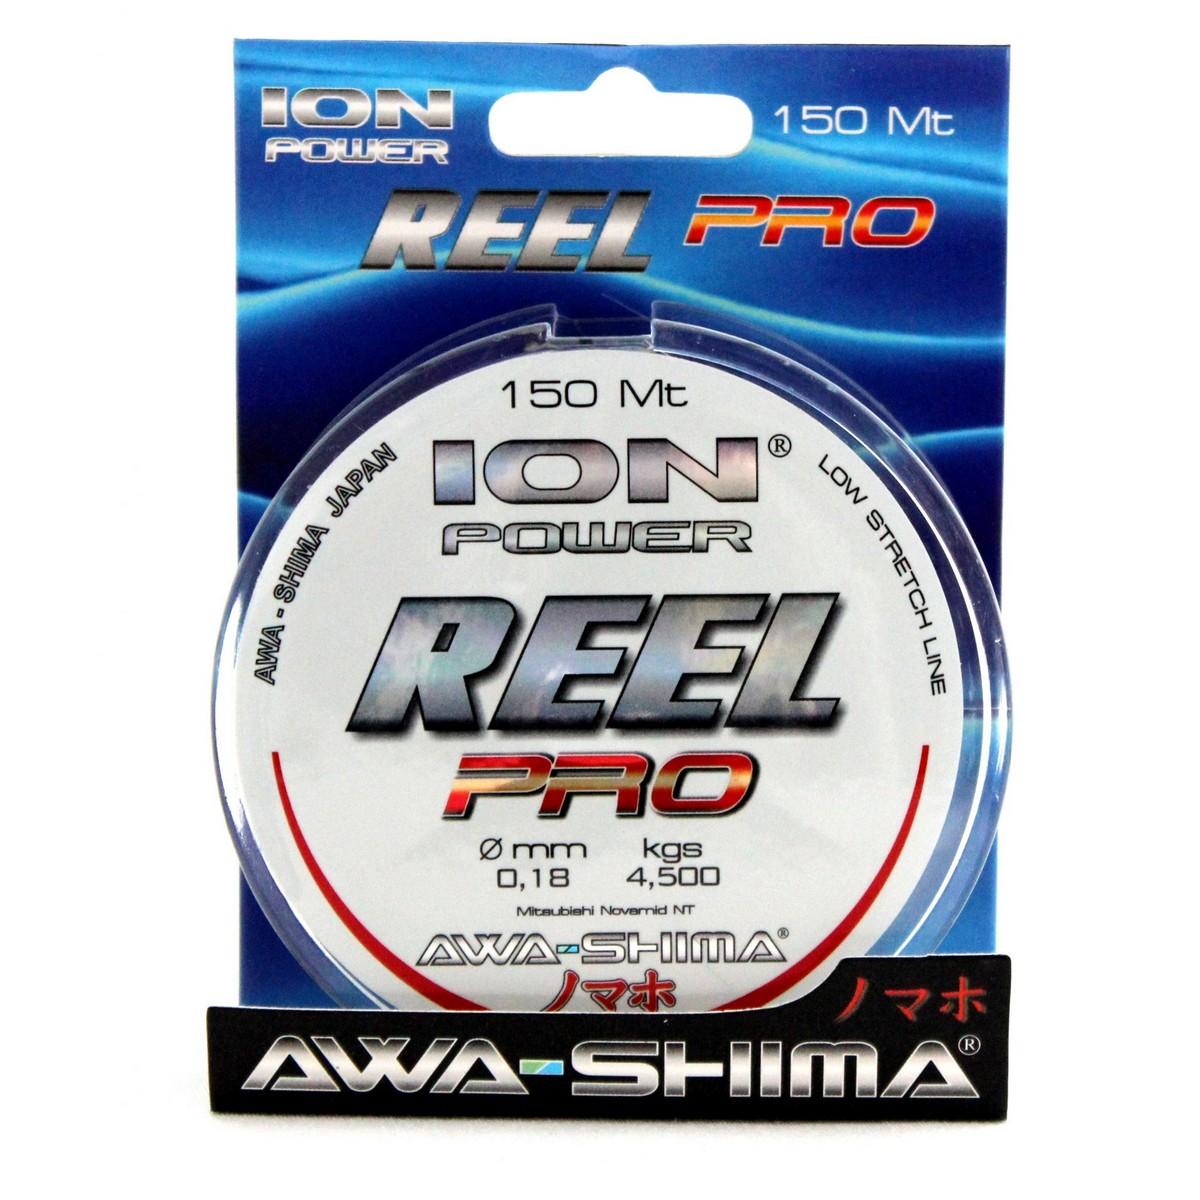 Awa-Shima Ion Power Reel Pro 150m-0